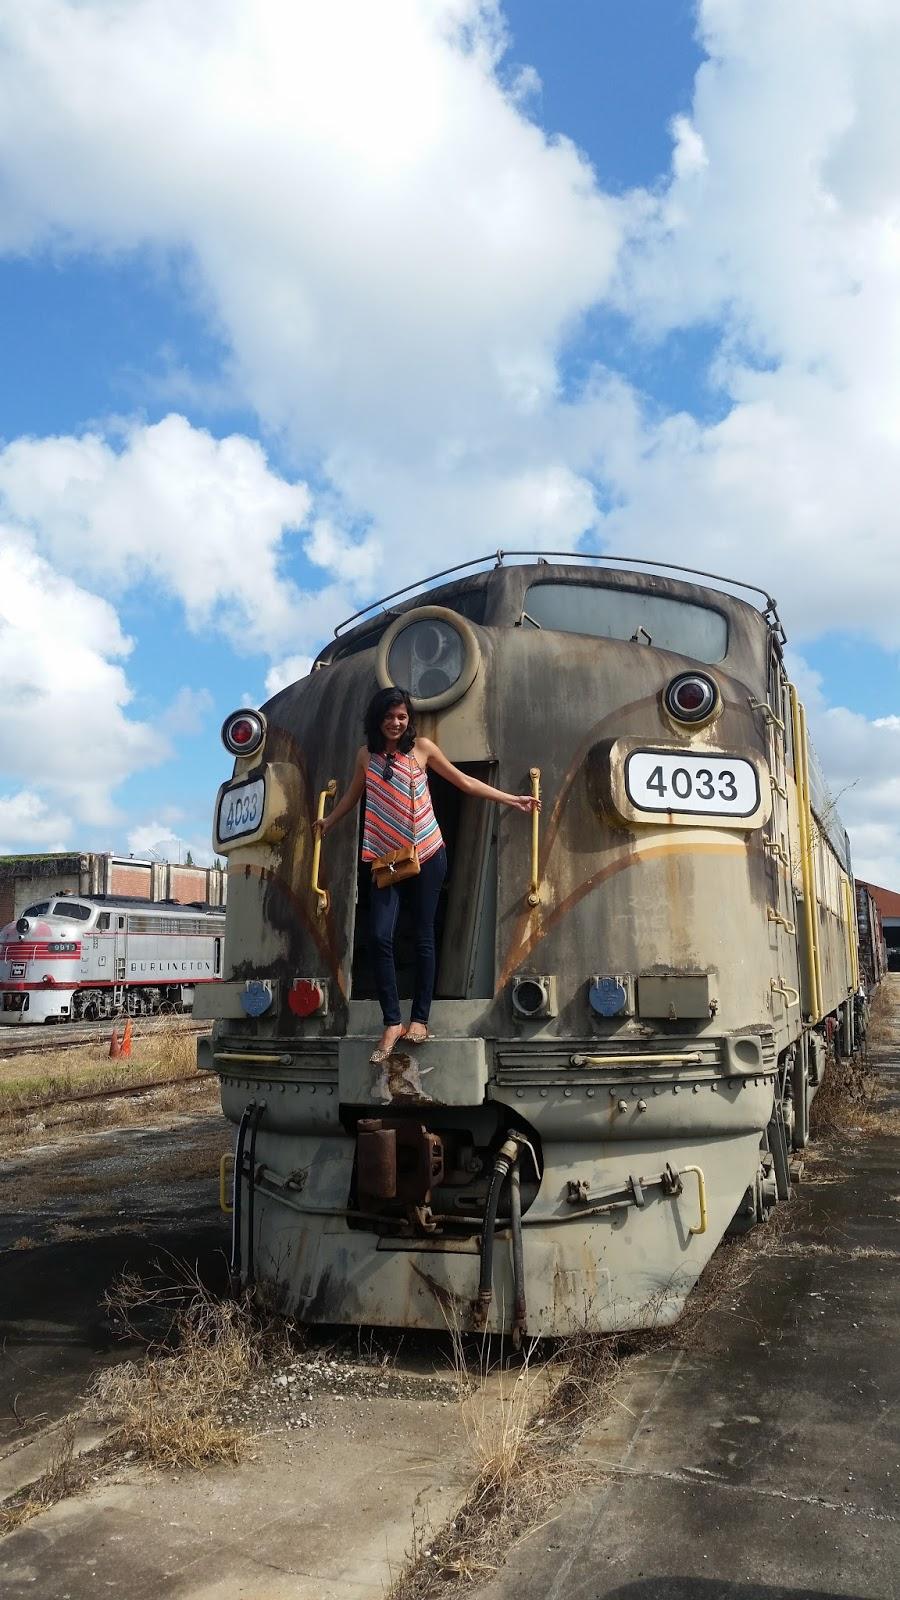 Brownsey Family: Miami Train Junkyard